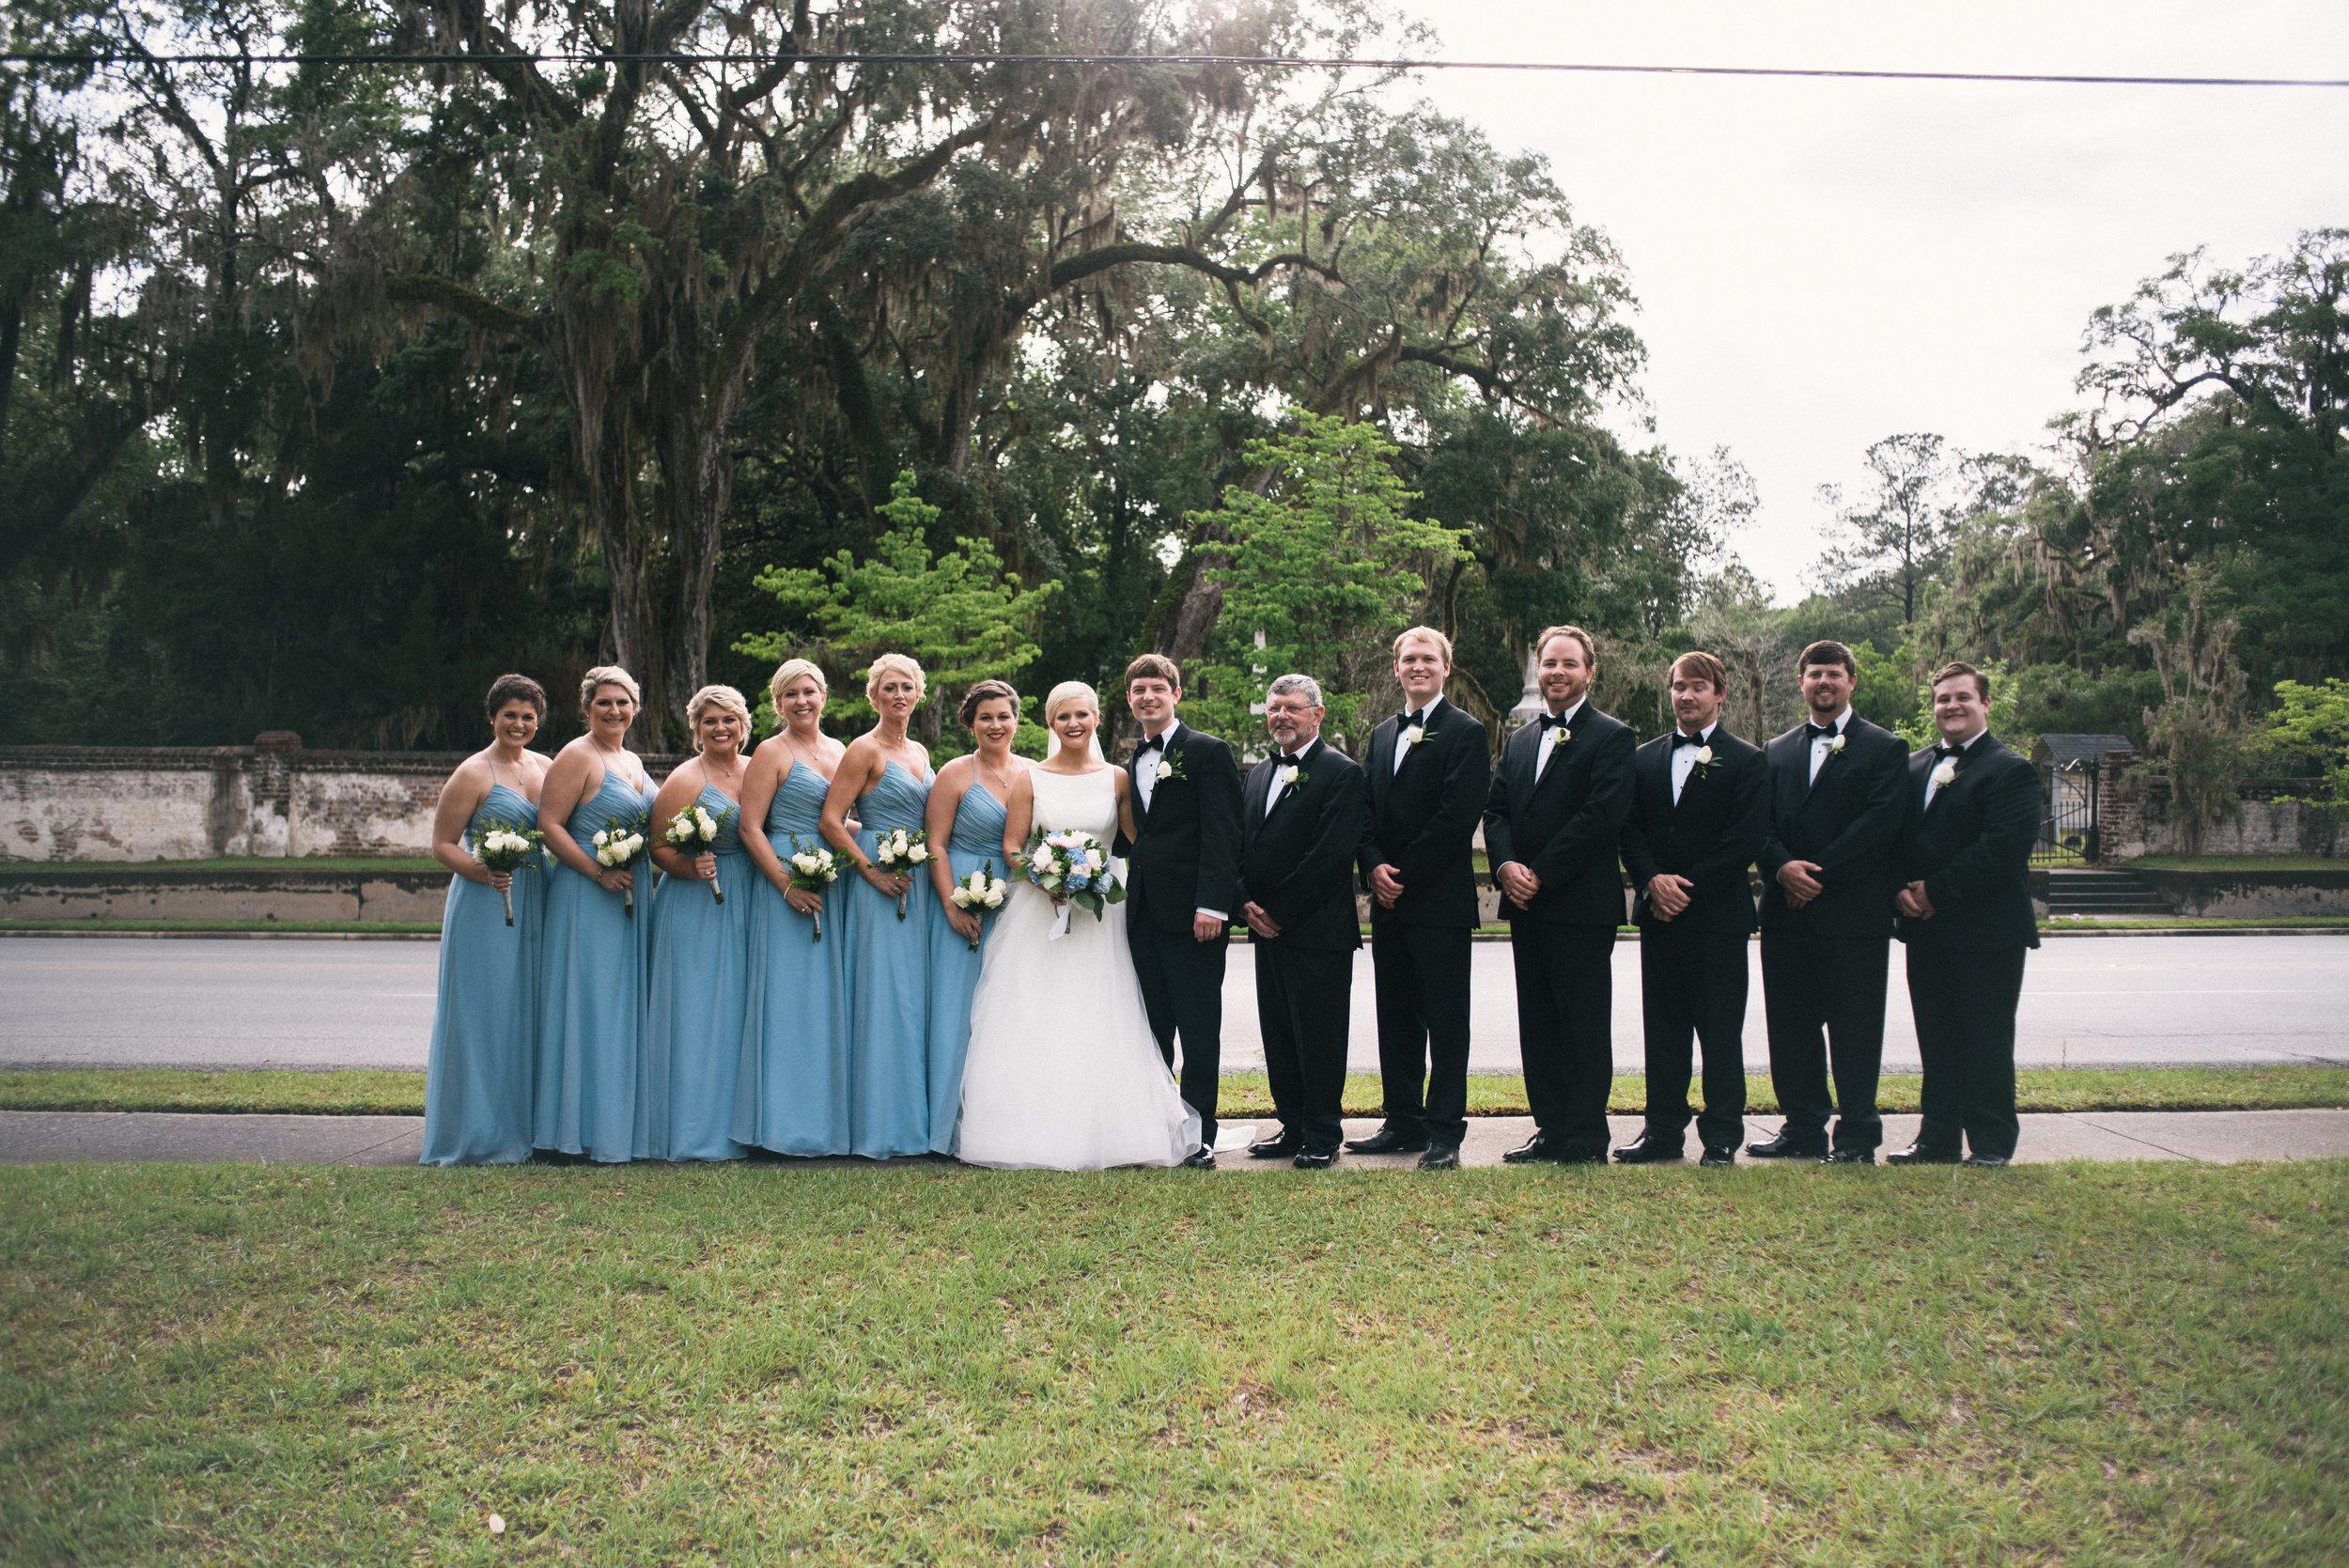 ali-and-jared-savannah-georgia-may-2017-wedding-meg-hill-photo-(341of760).jpg